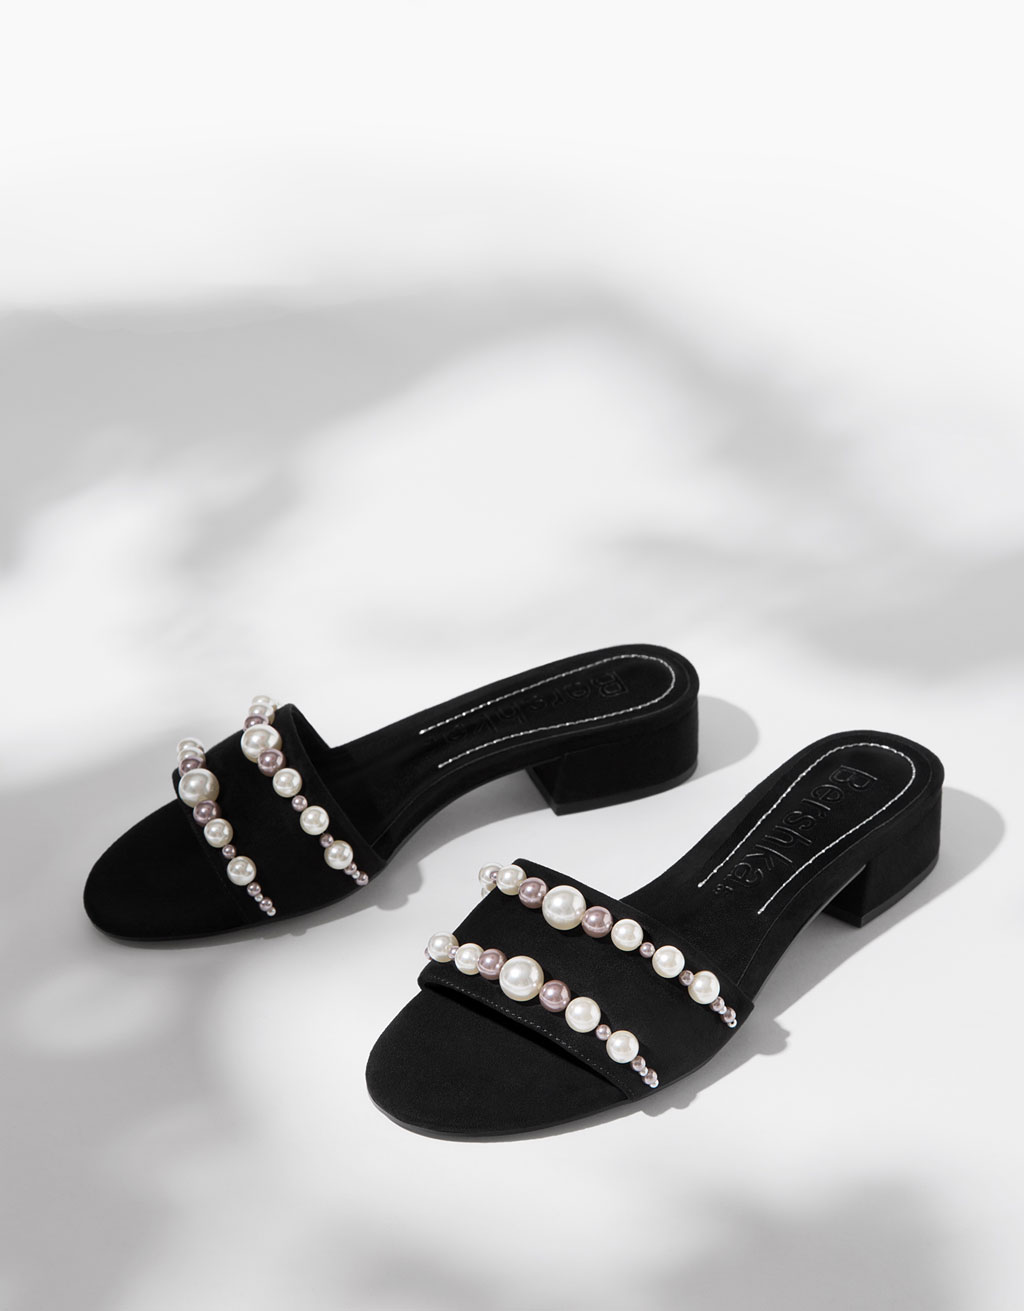 Alçak topuklu incili ayakkabı